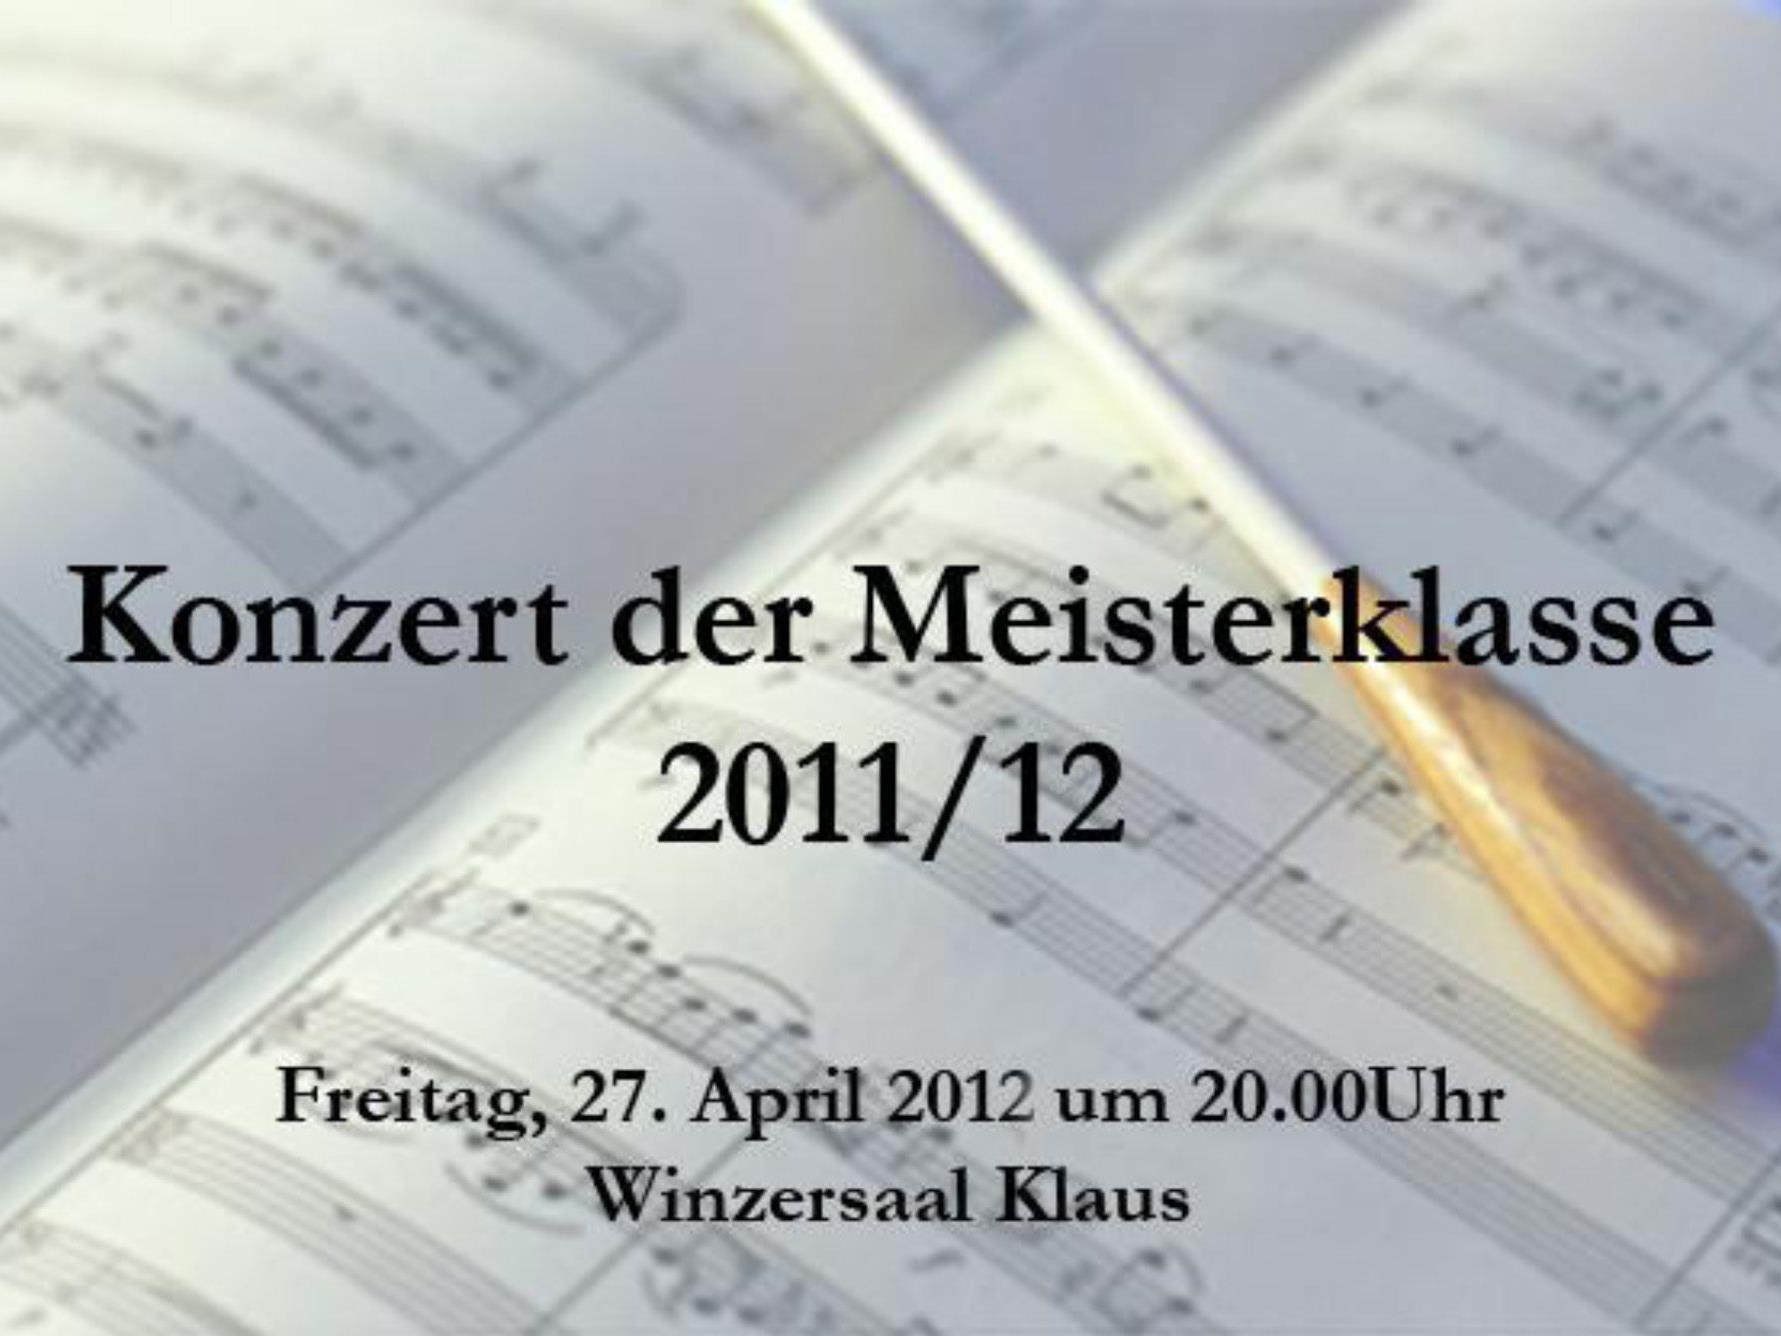 Konzert der Meisterklasse im Klauser Winzersaal